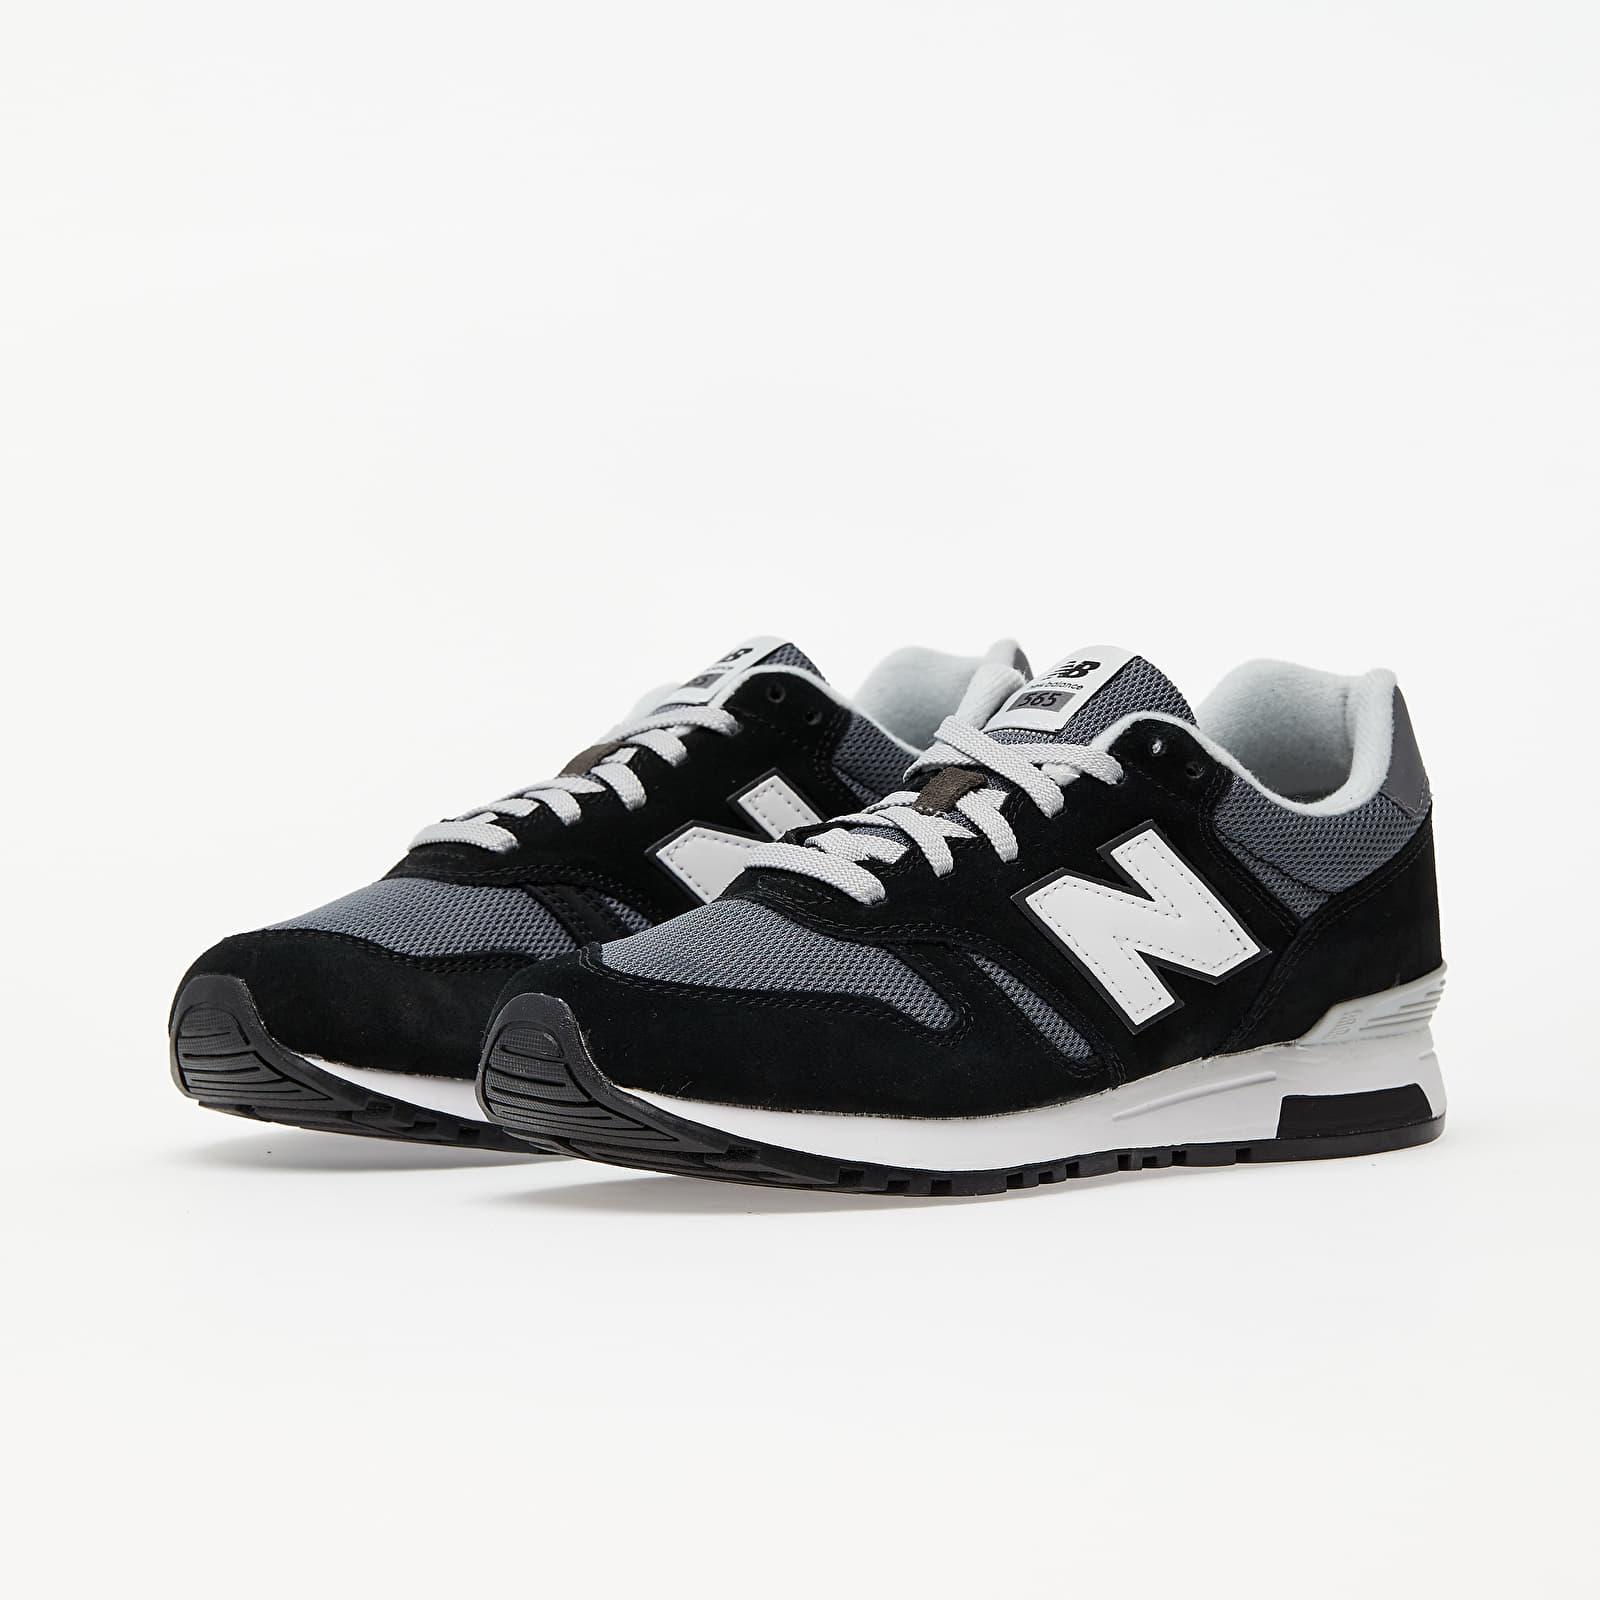 New Balance 565 Black/ Grey | Footshop